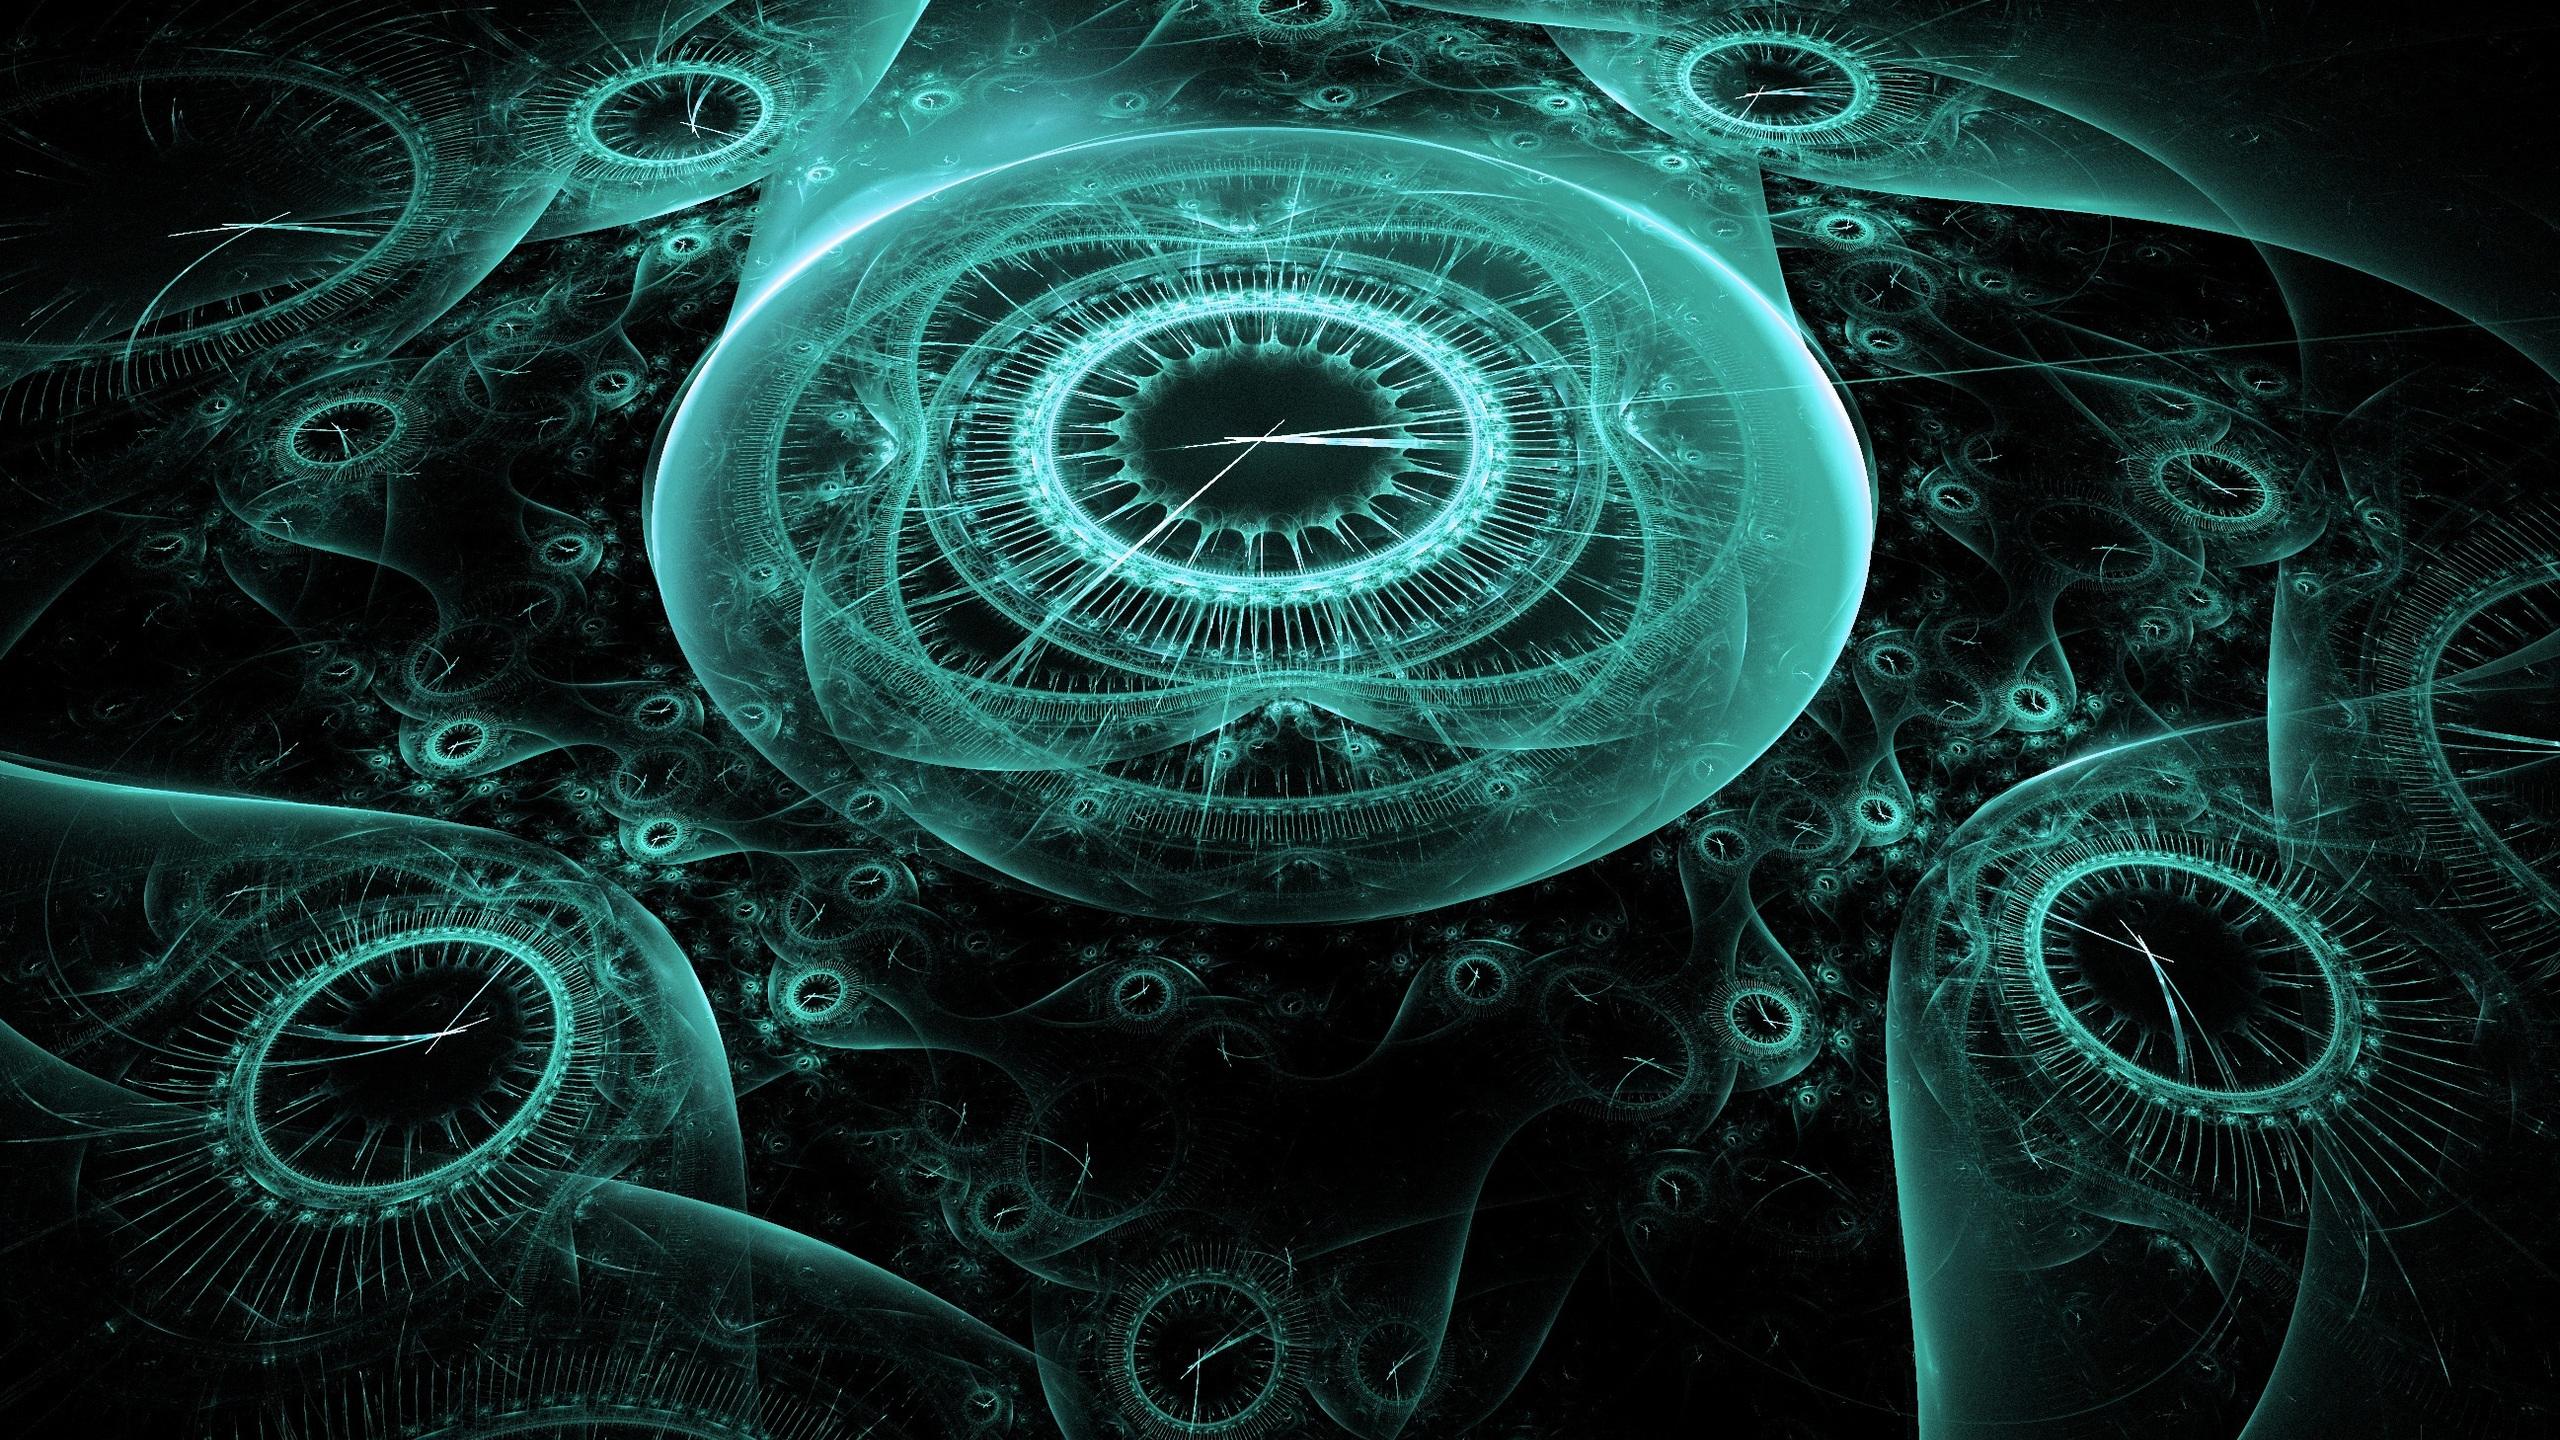 2560x1440 time clock digital creative illustration 1440p resolution